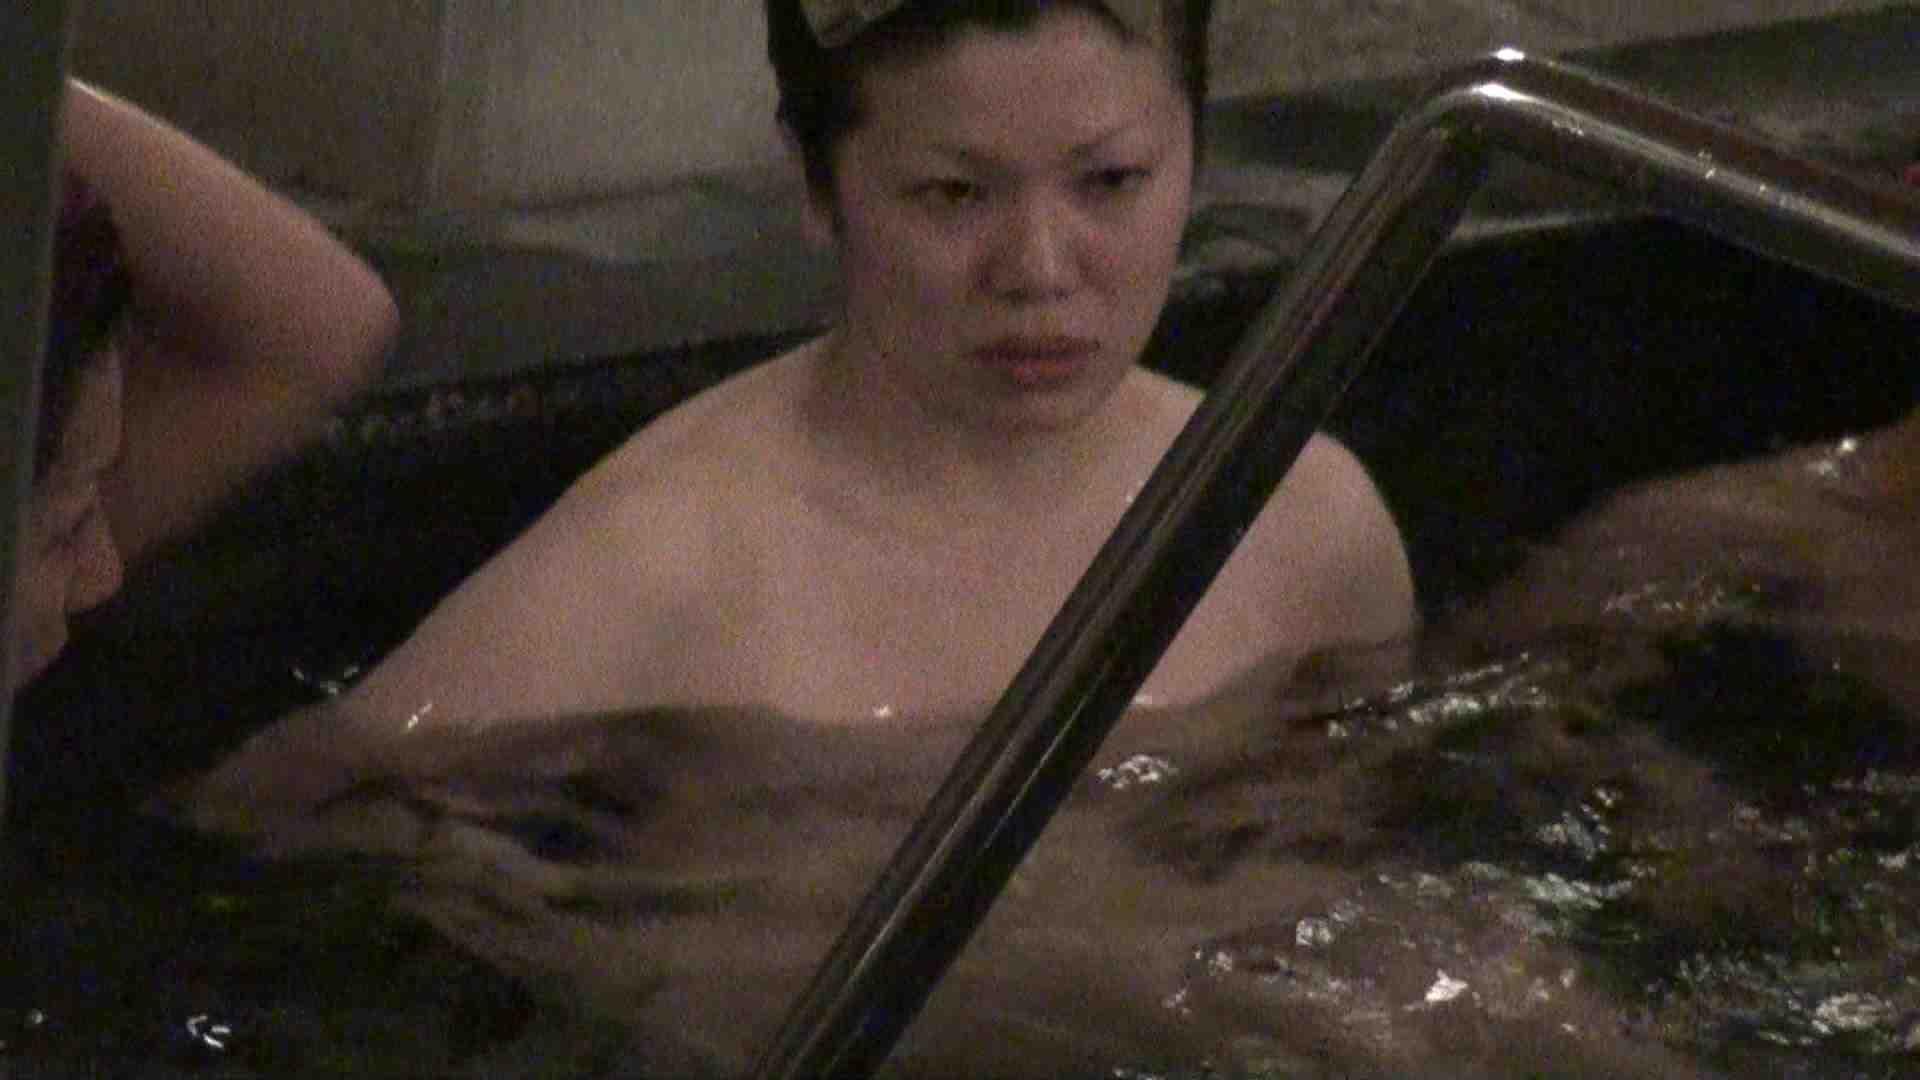 Aquaな露天風呂Vol.359 露天 ワレメ動画紹介 26連発 24